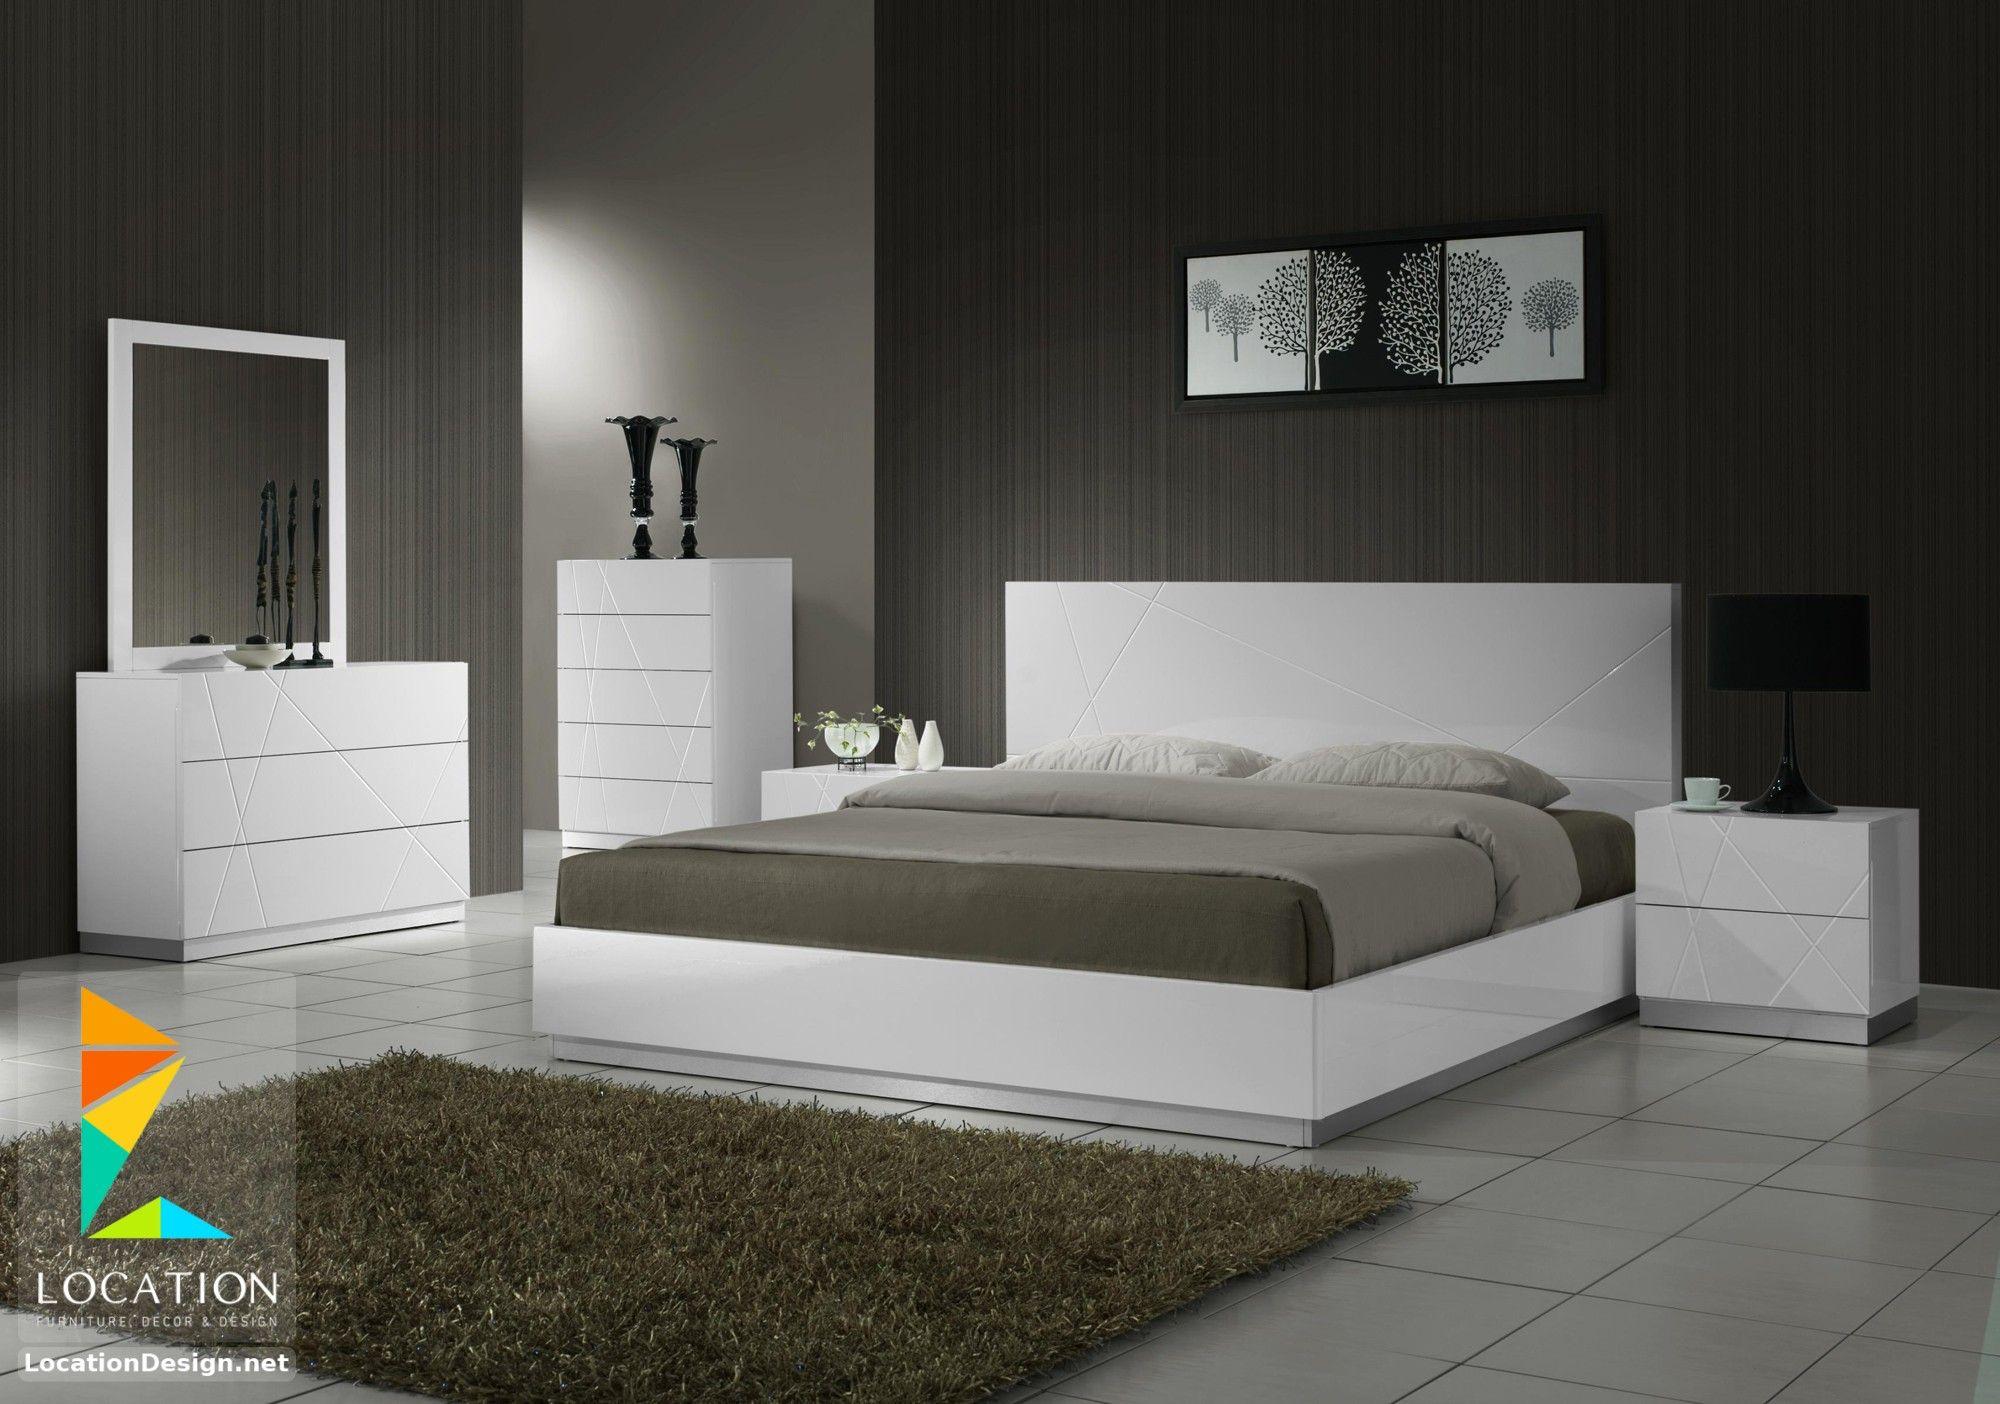 غرف نوم للعرسان تركية 2019 2020 Platform Bedroom Sets Luxury Bedroom Sets Cheap Bedroom Furniture